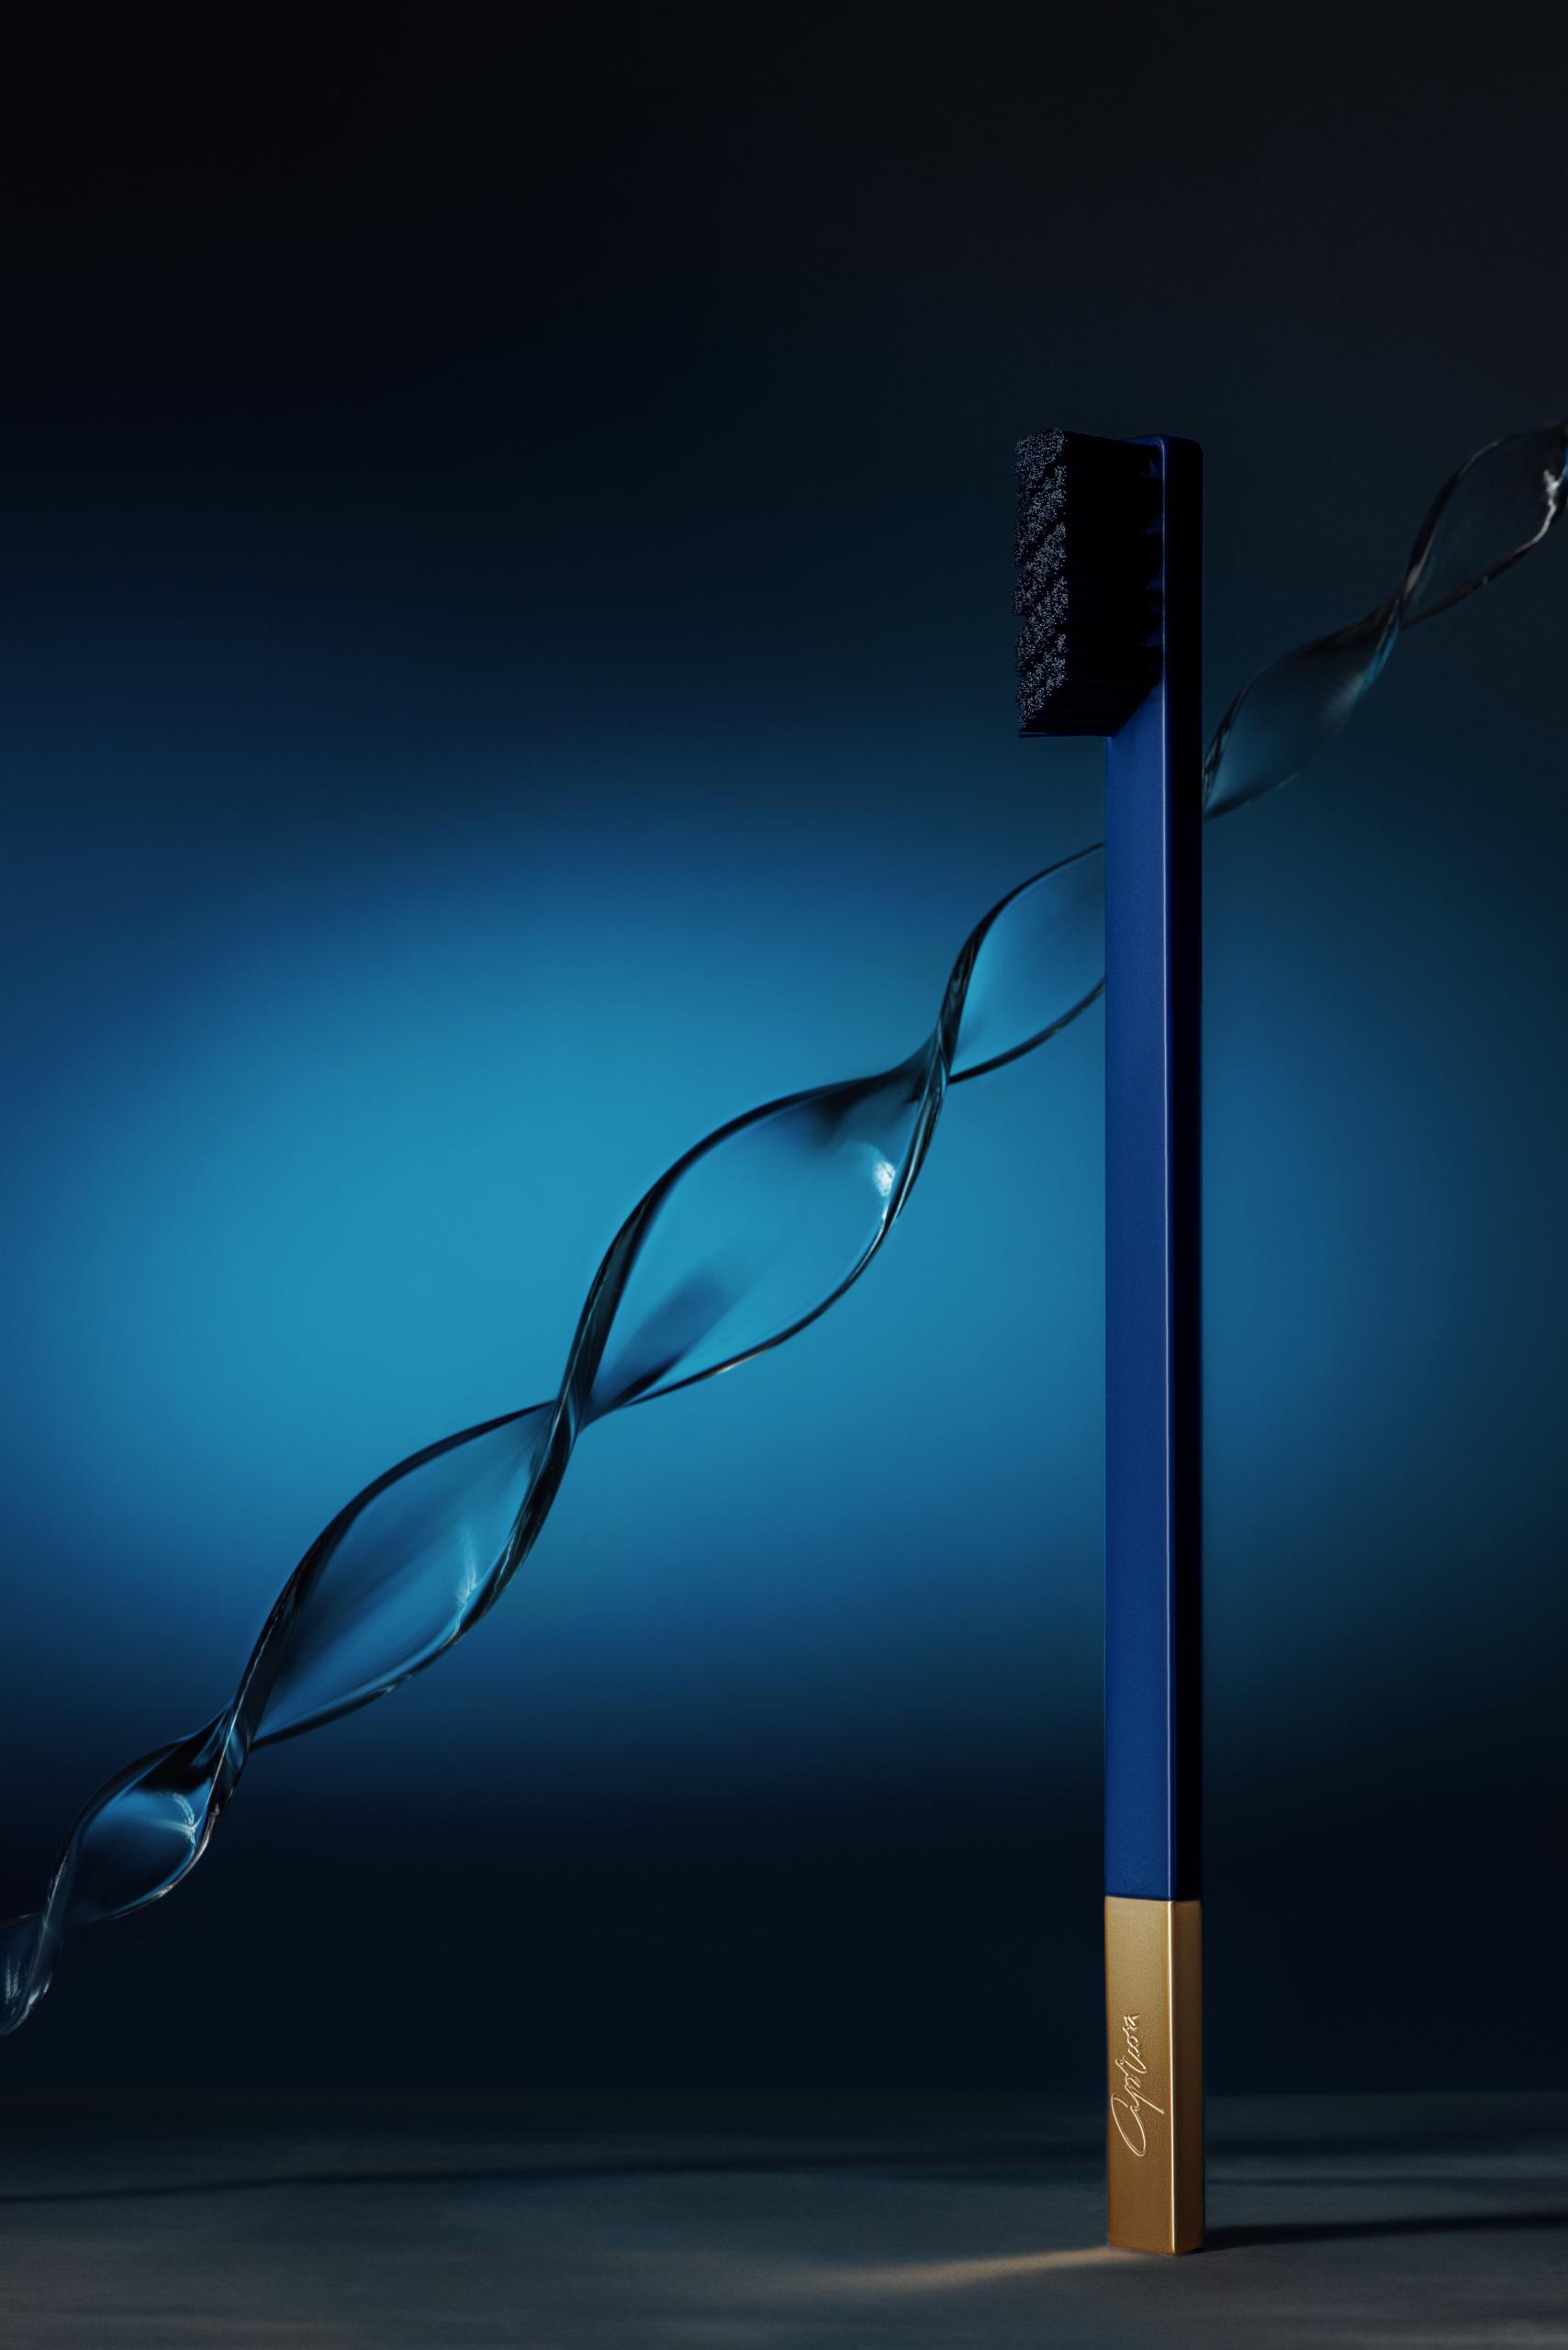 SLIM by Apriori sapphire & gold designer toothbrush